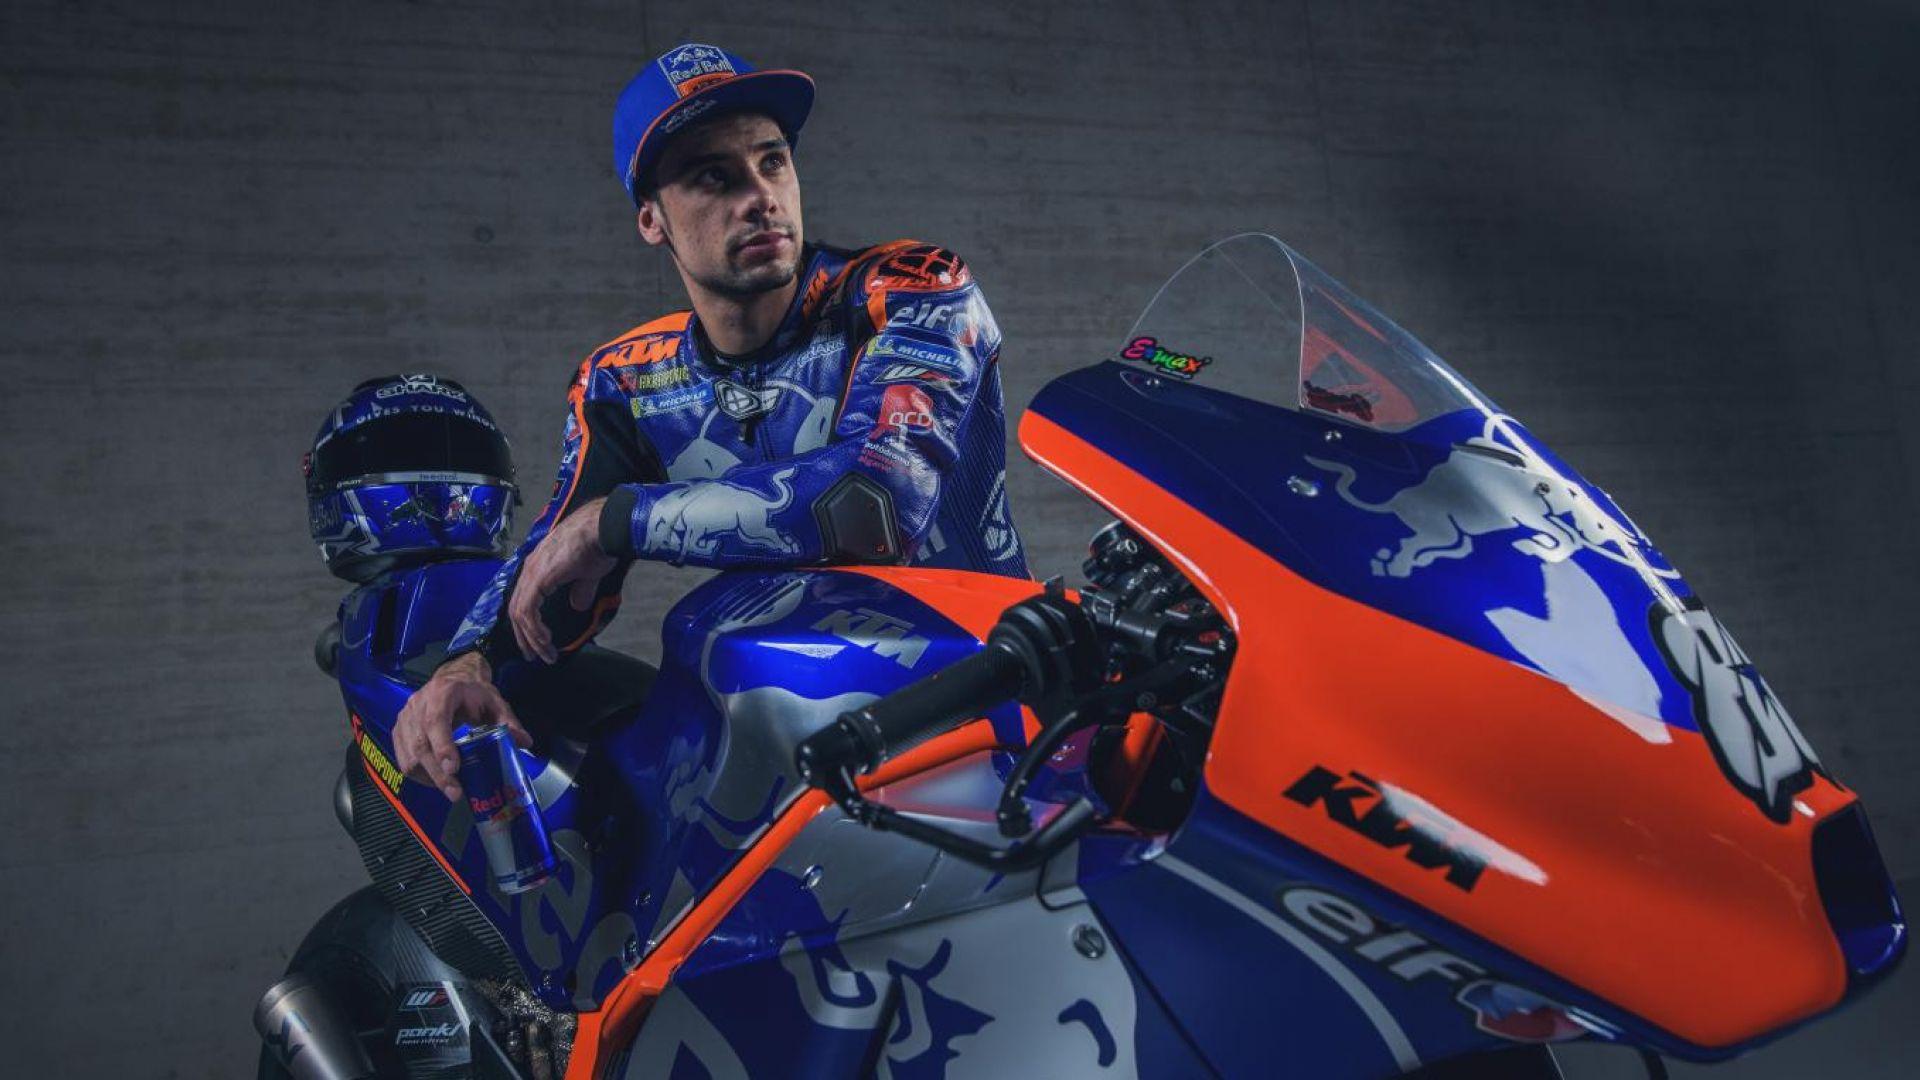 MotoGP 2019, Miguel Oliveira - Red Bull KTM Tech 3 - MotorBox